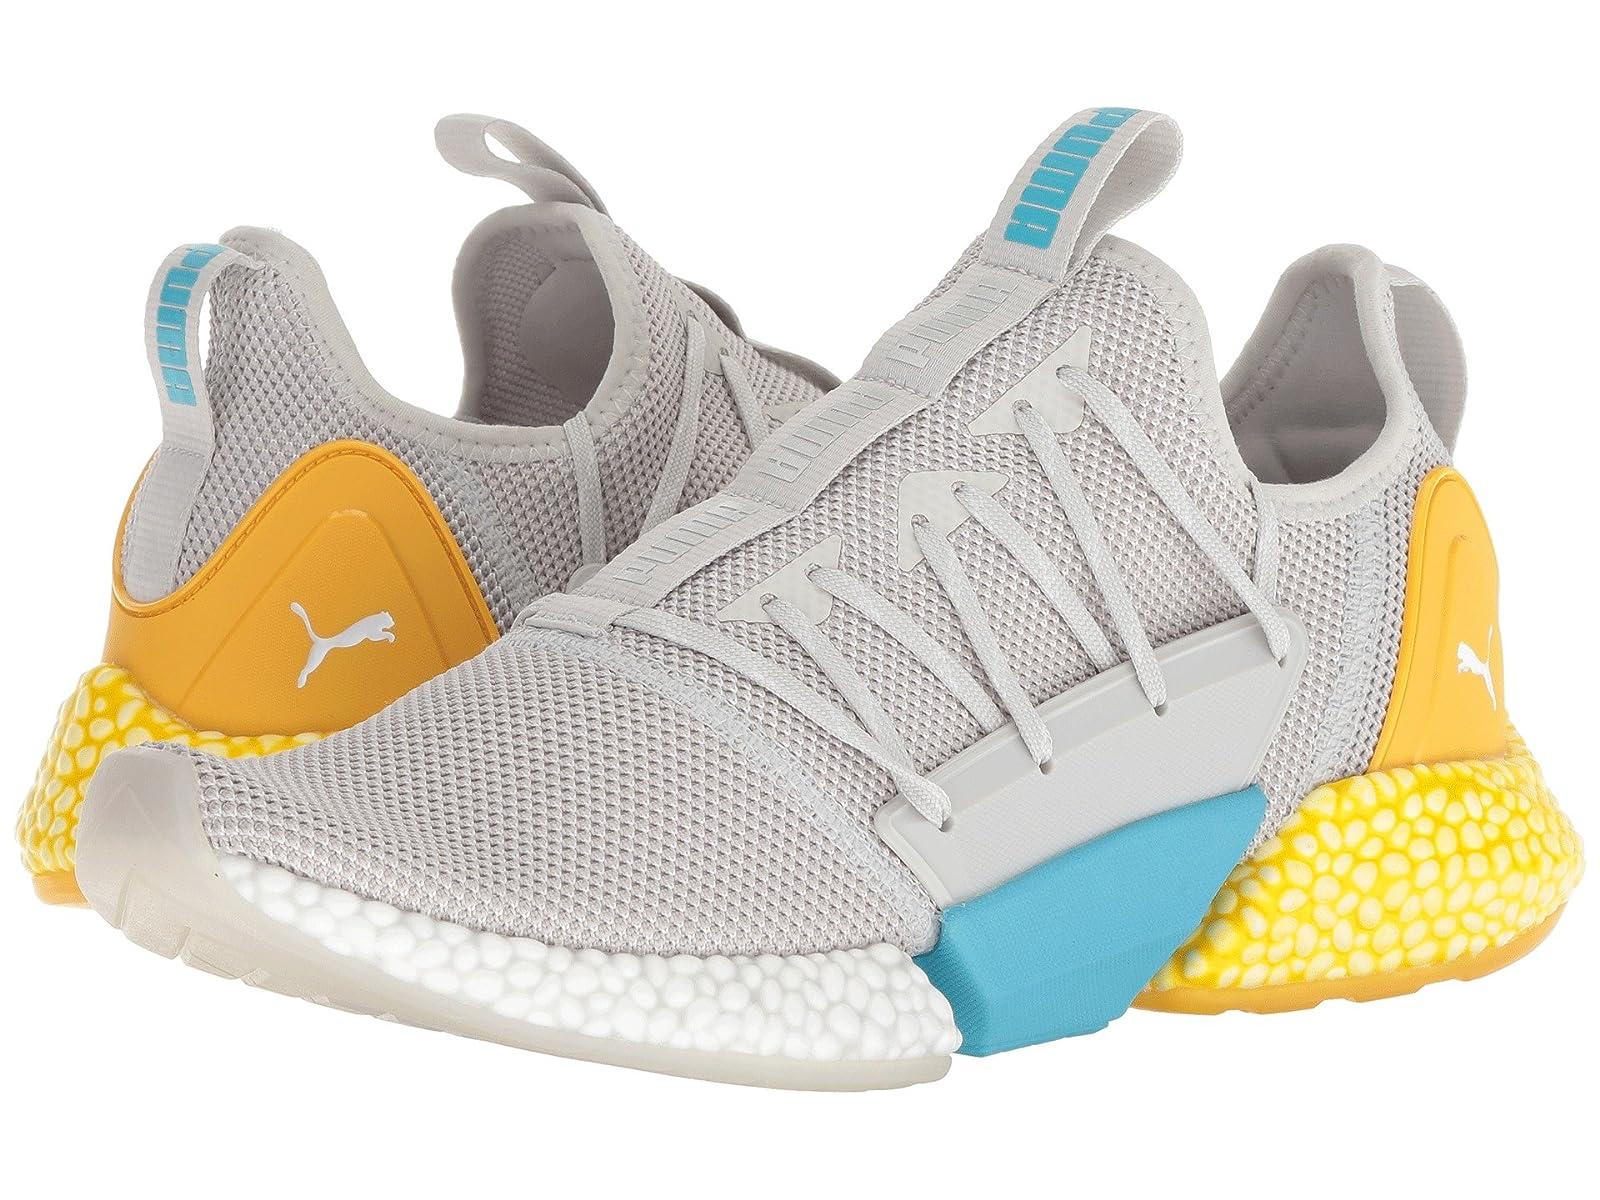 PUMA Hybrid Rocket RunnerAtmospheric grades have affordable shoes